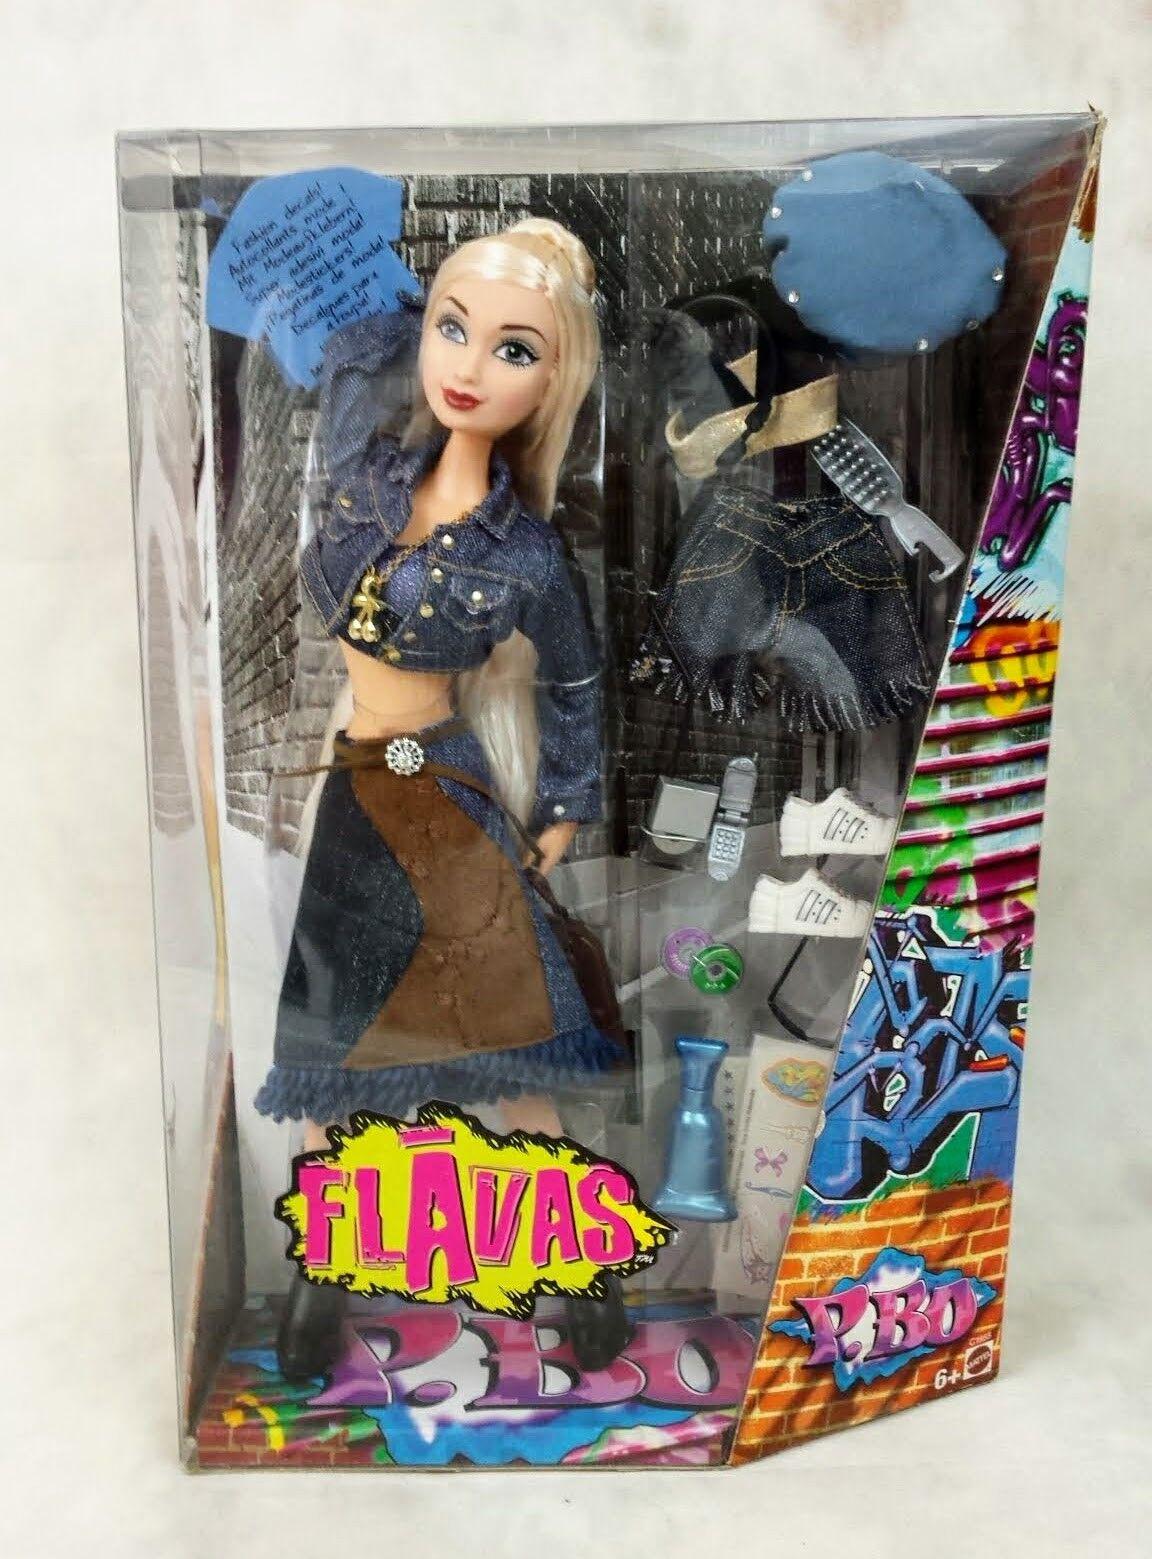 Flavas P.BO Blonde version Rapper Mattel 2003 rare BNIB